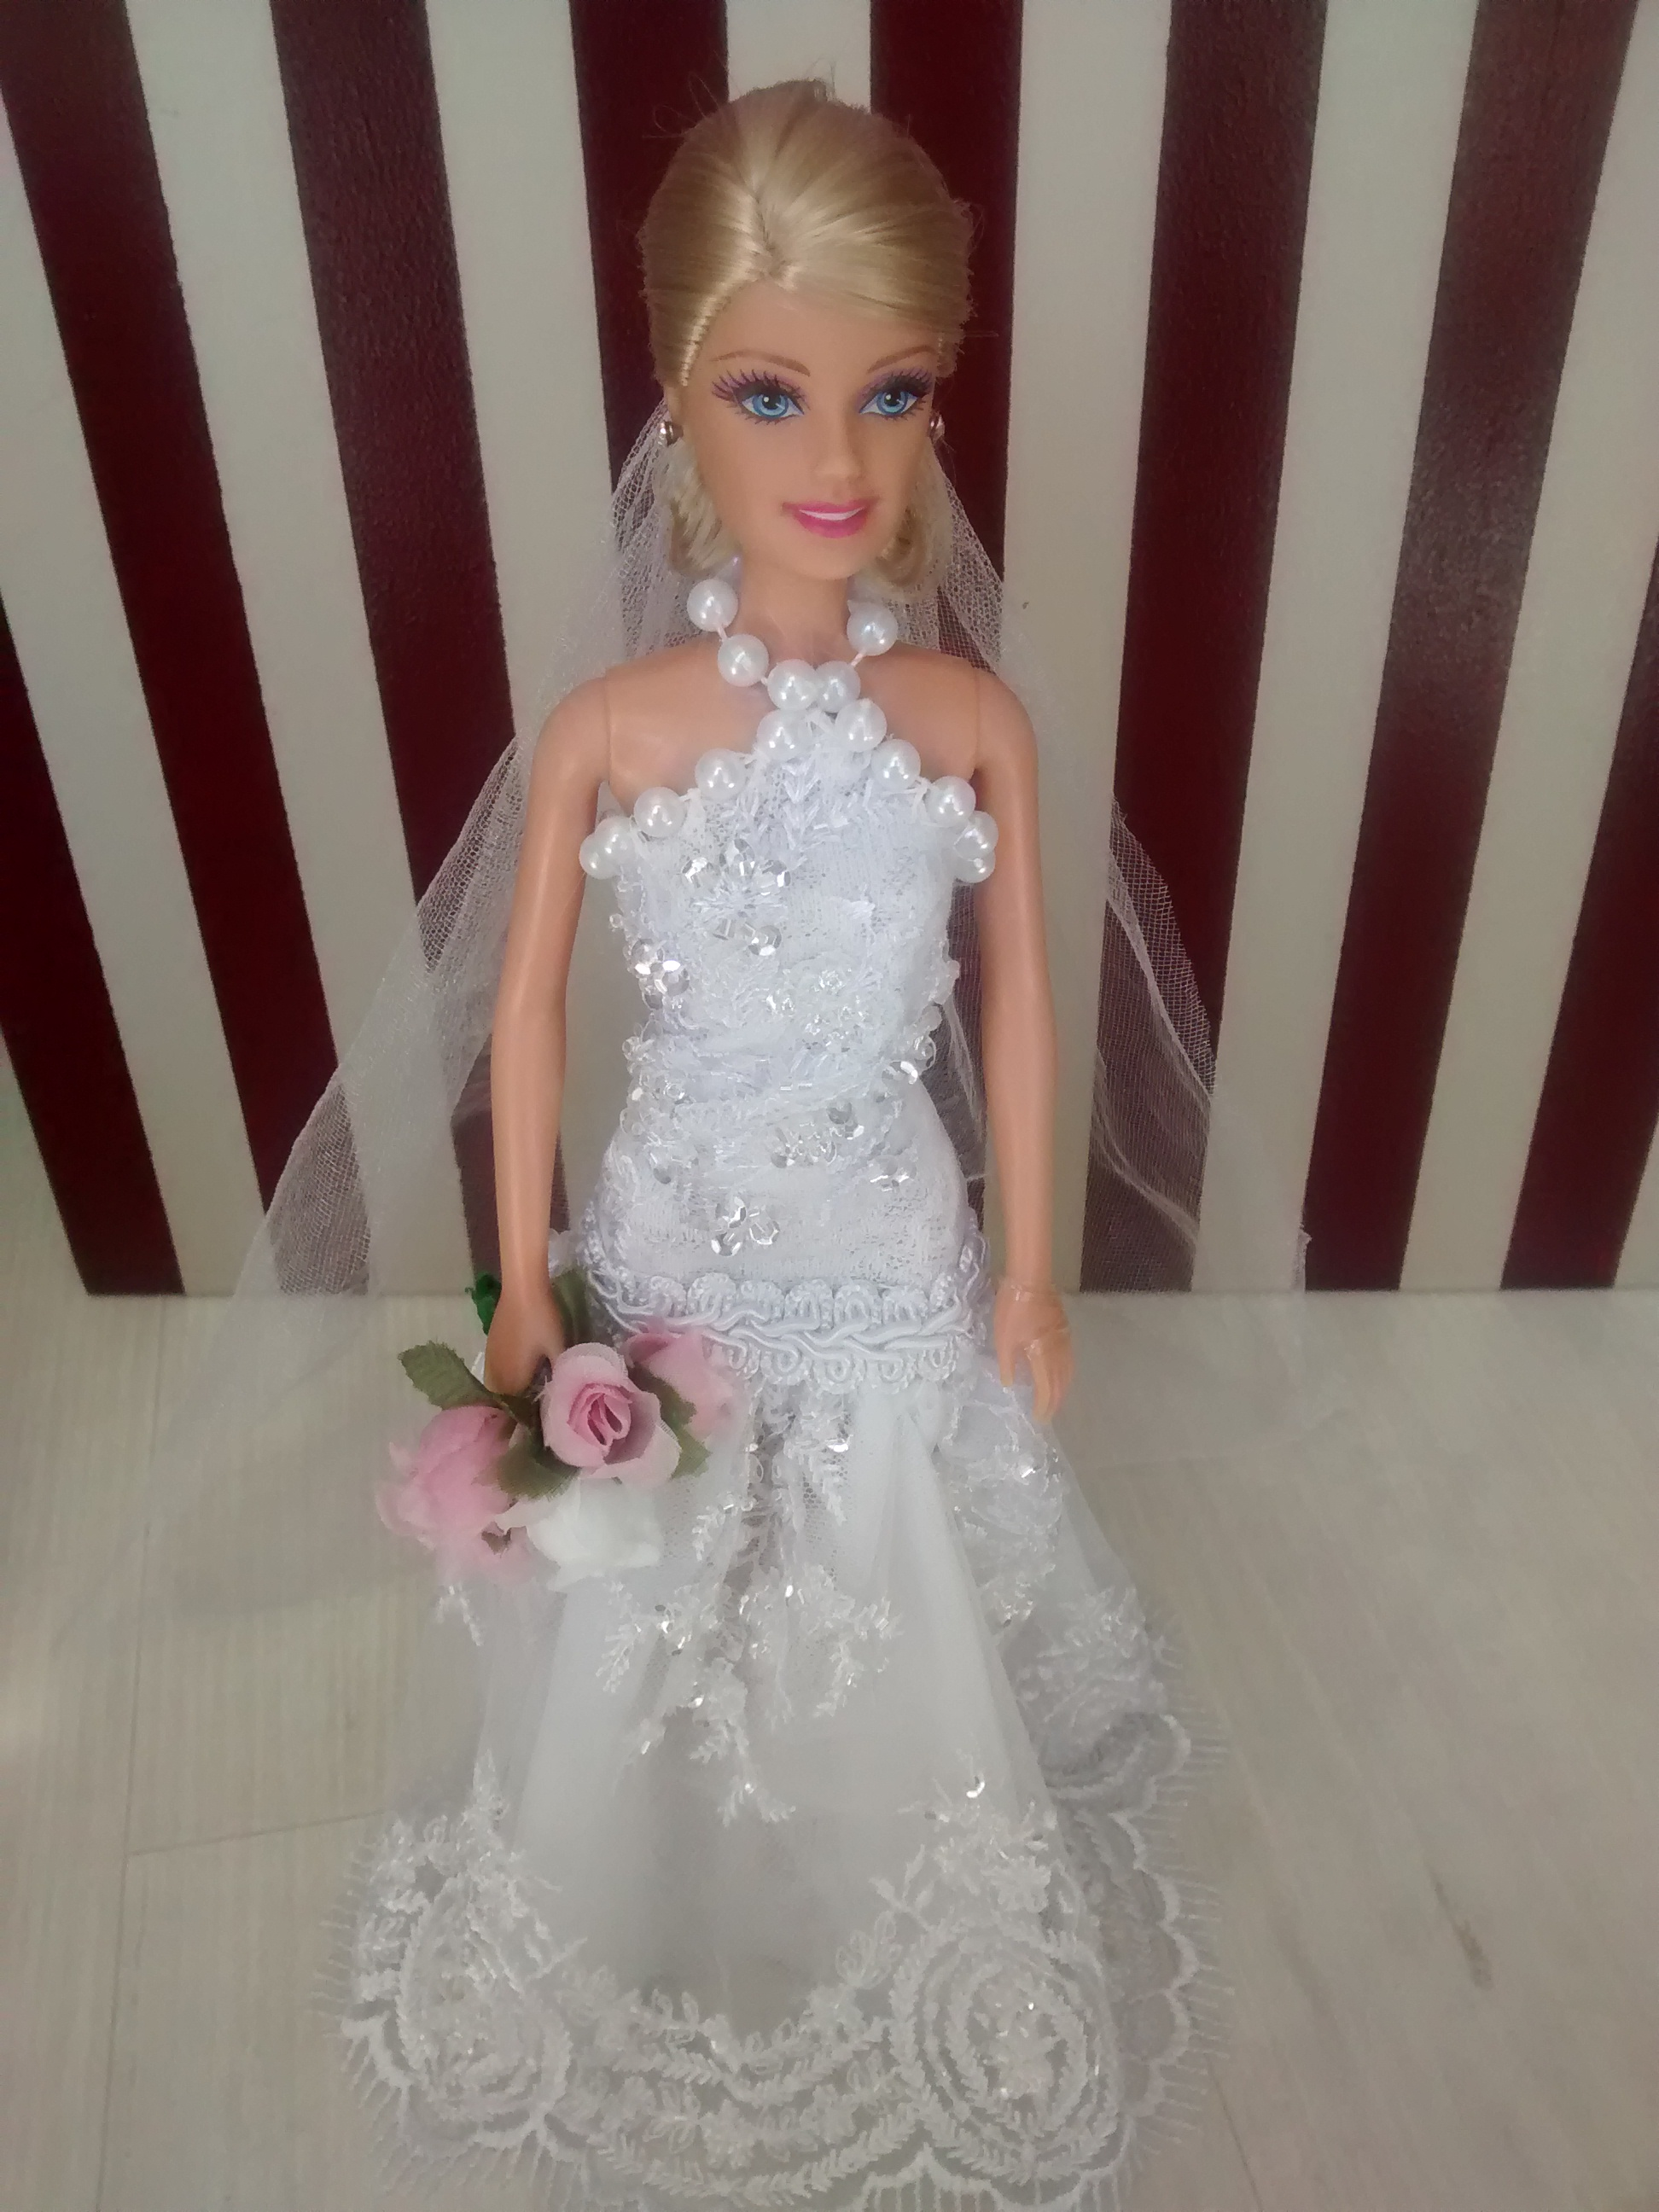 Barbie Noiva ~ Barbie Noiva Pearl Luigi Fashion Dolls Elo7